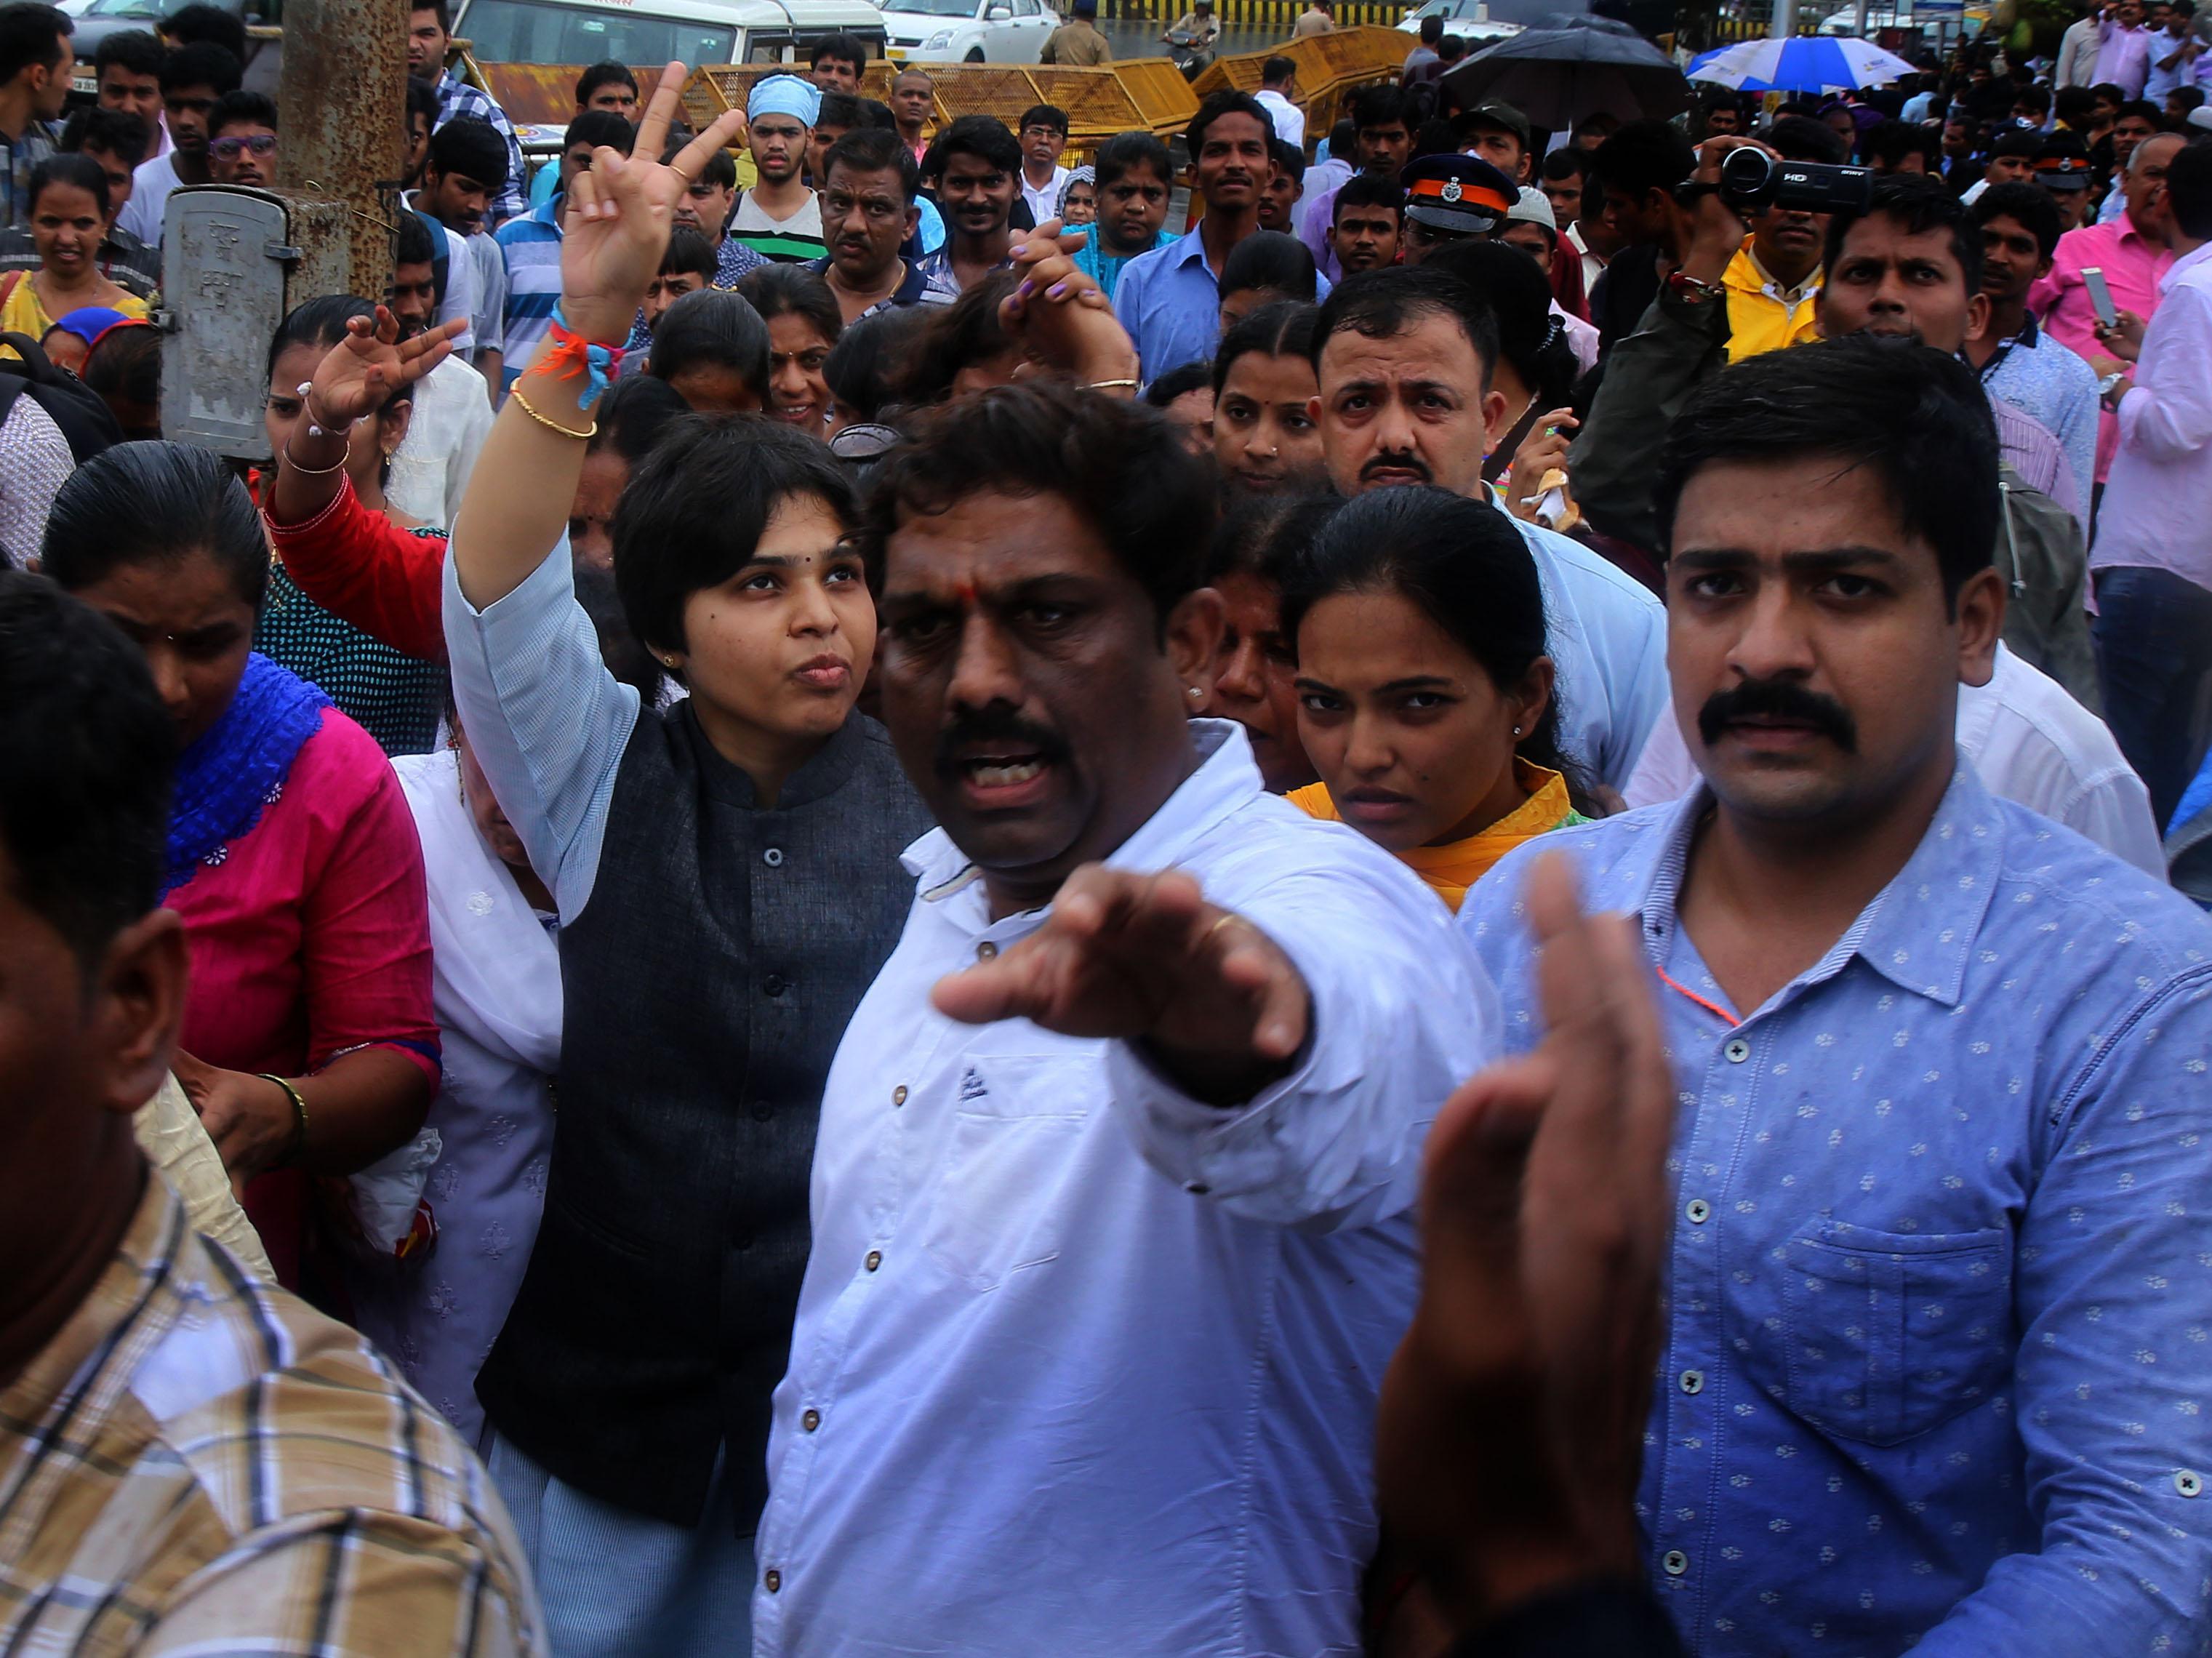 Women's group led by Trupti Desai visits haji Ali Dargah in Mumbai on Sunday. Express photo by Nirmal Harindran, 28th August, 2016, Mumbai.